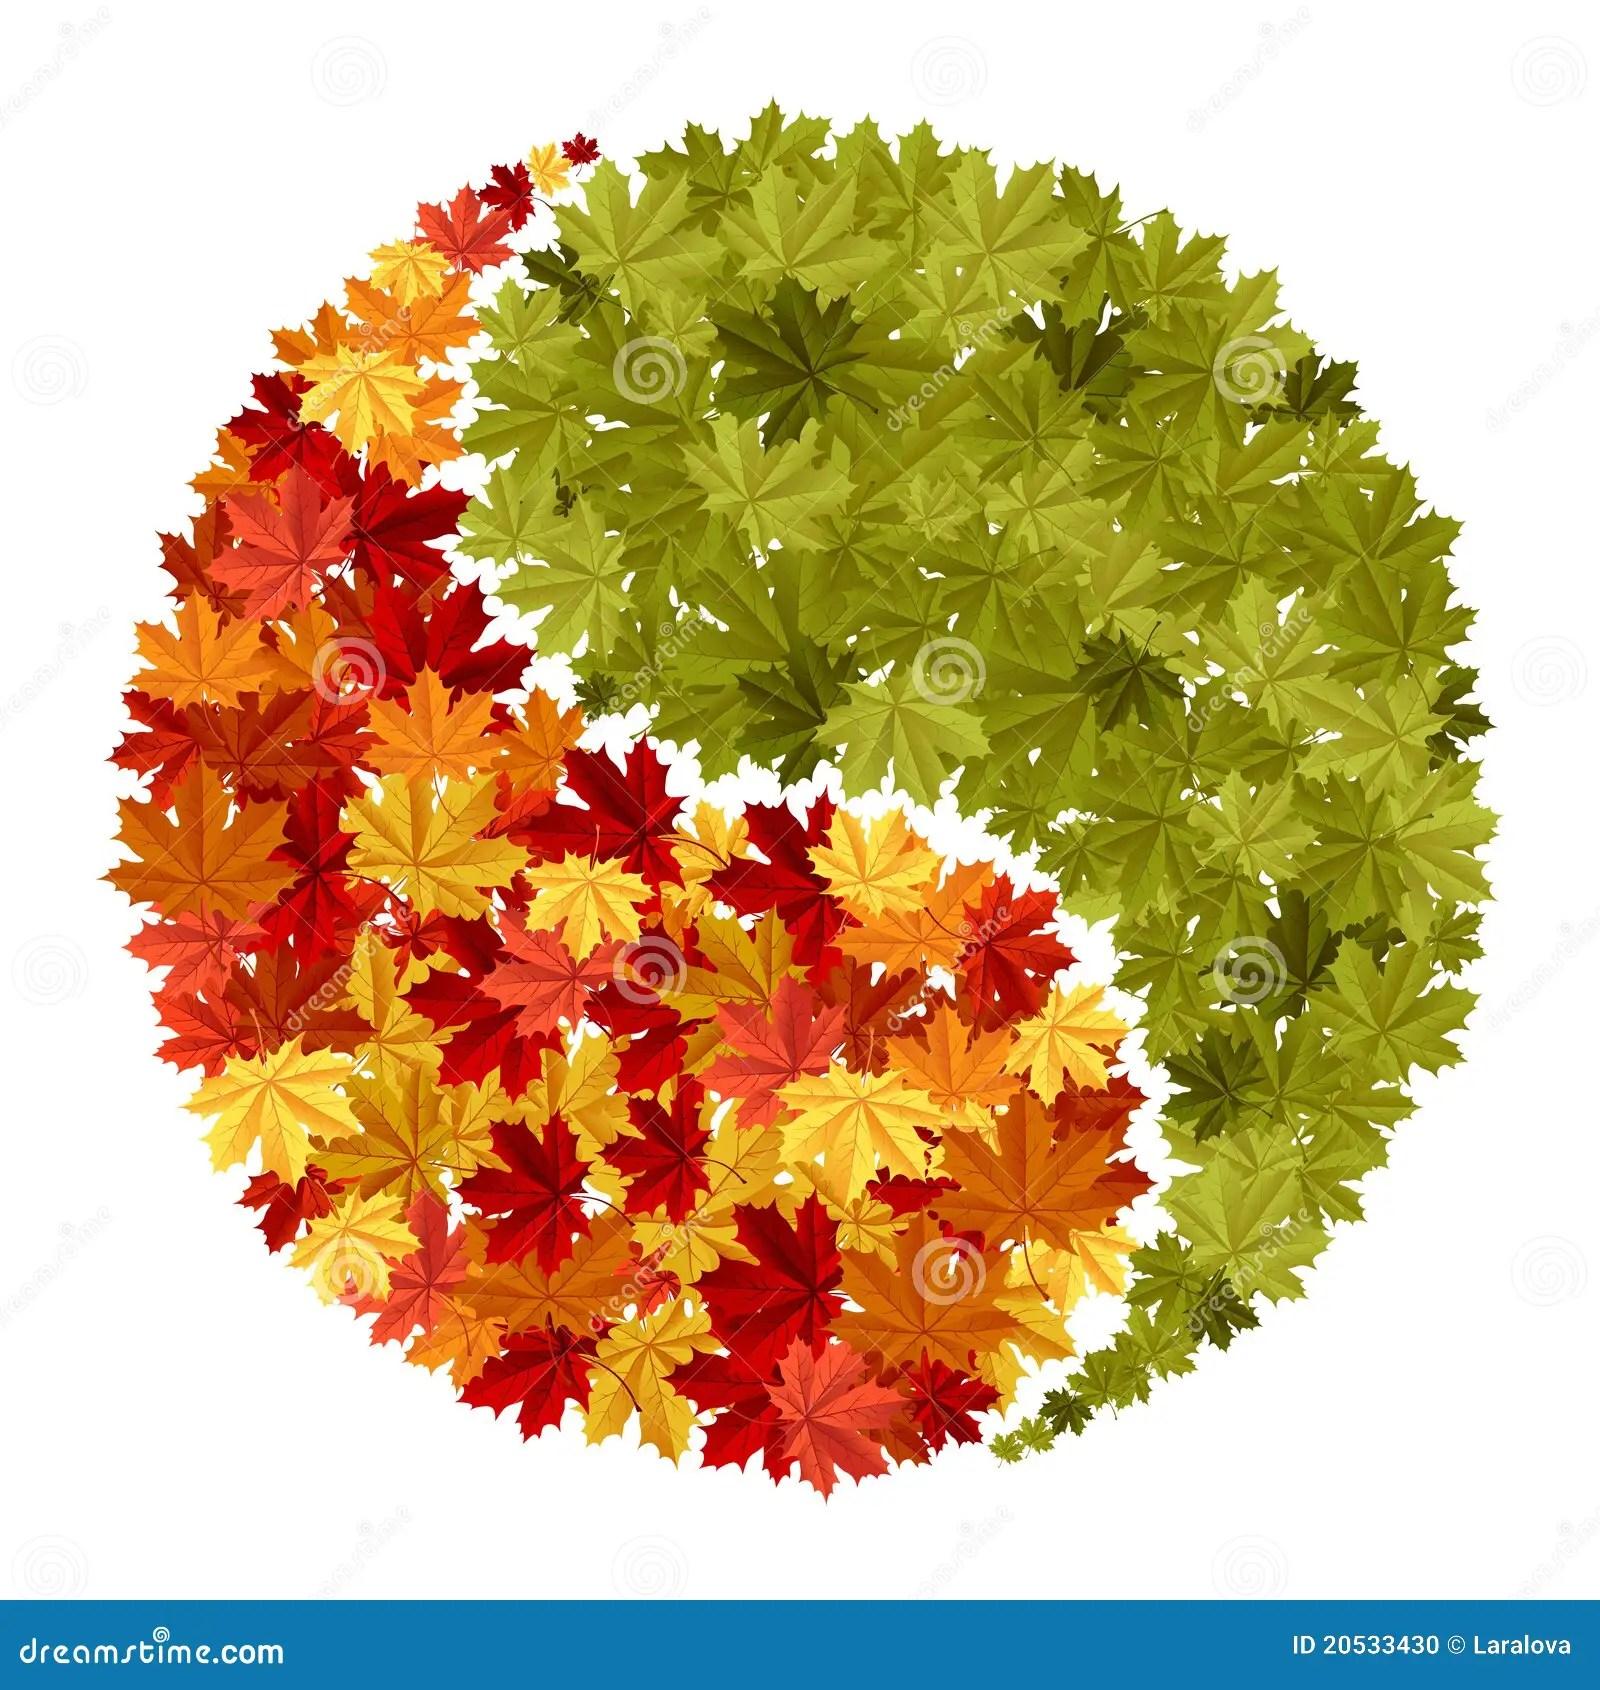 Free Wallpaper Fall Season Maple Yin Yang Symbol Stock Vector Image Of Balance